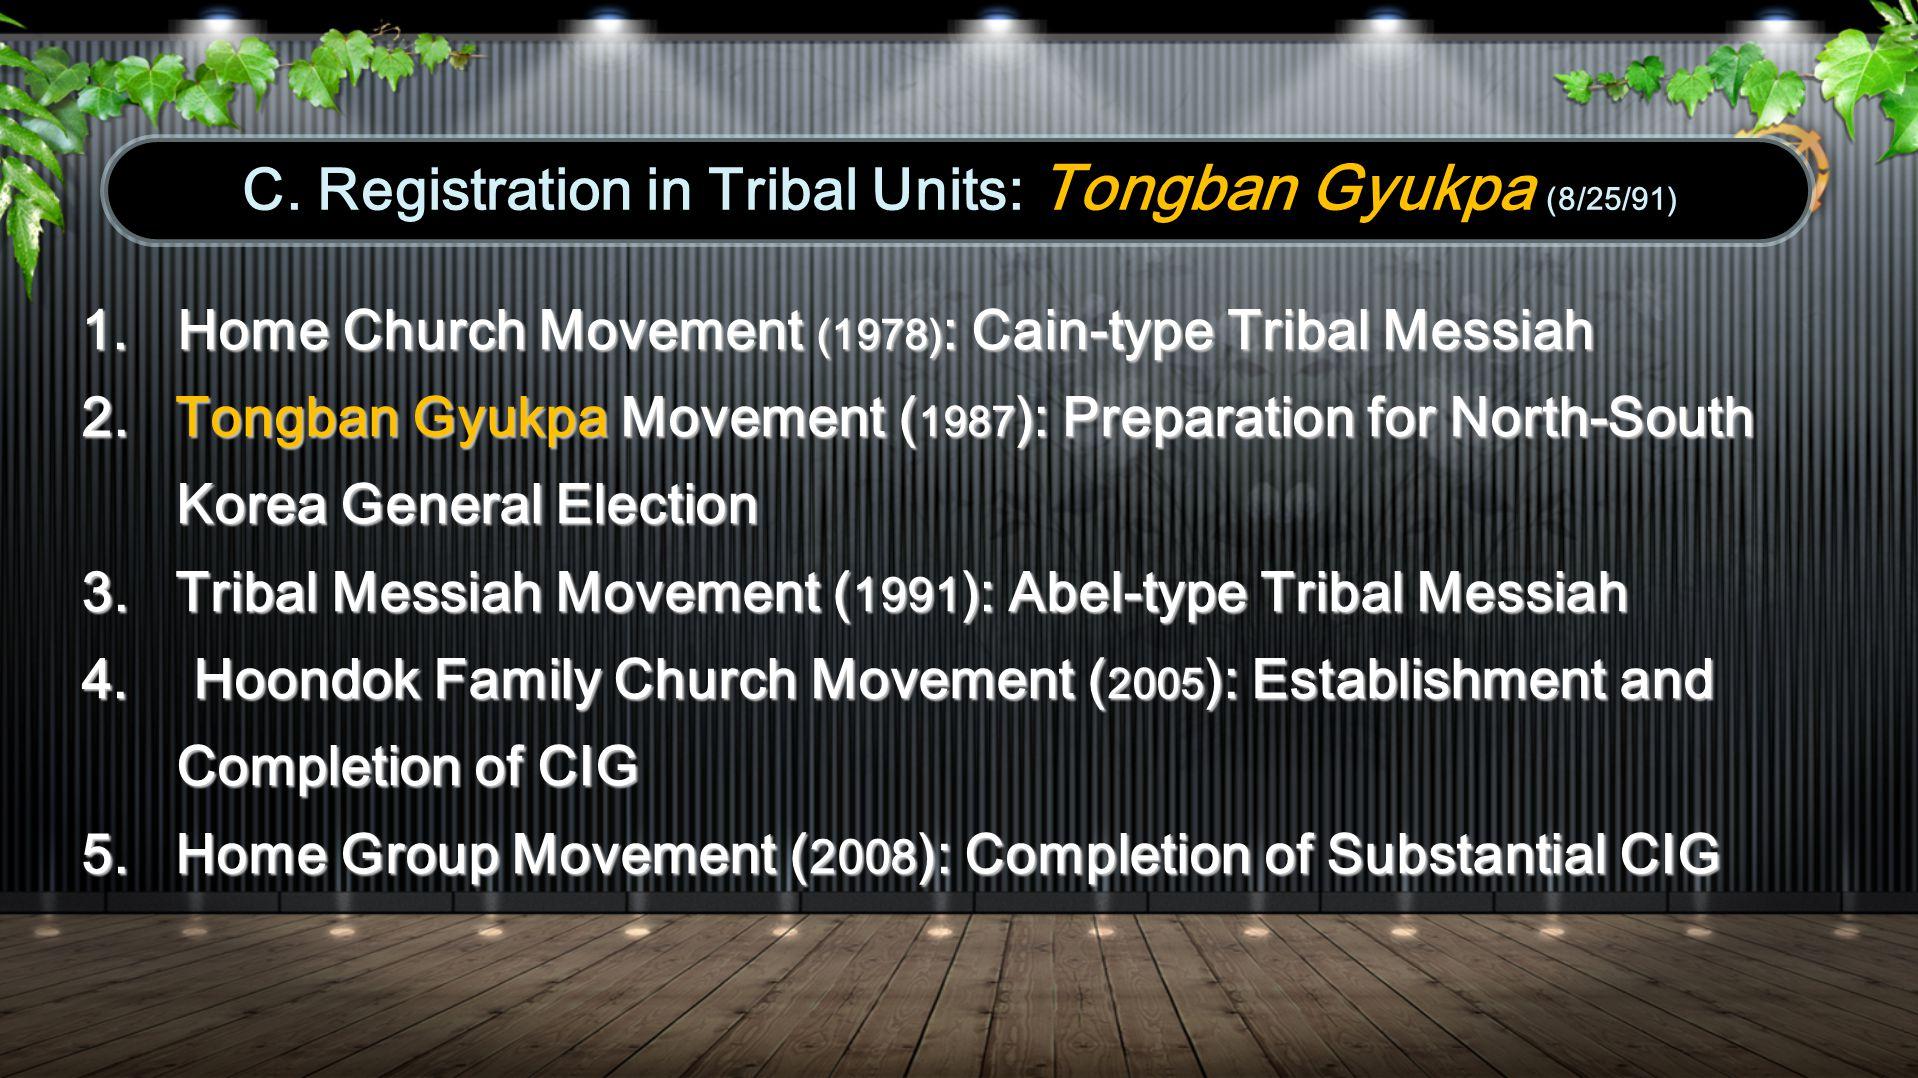 C. Registration in Tribal Units: Tongban Gyukpa (8/25/91) 1.